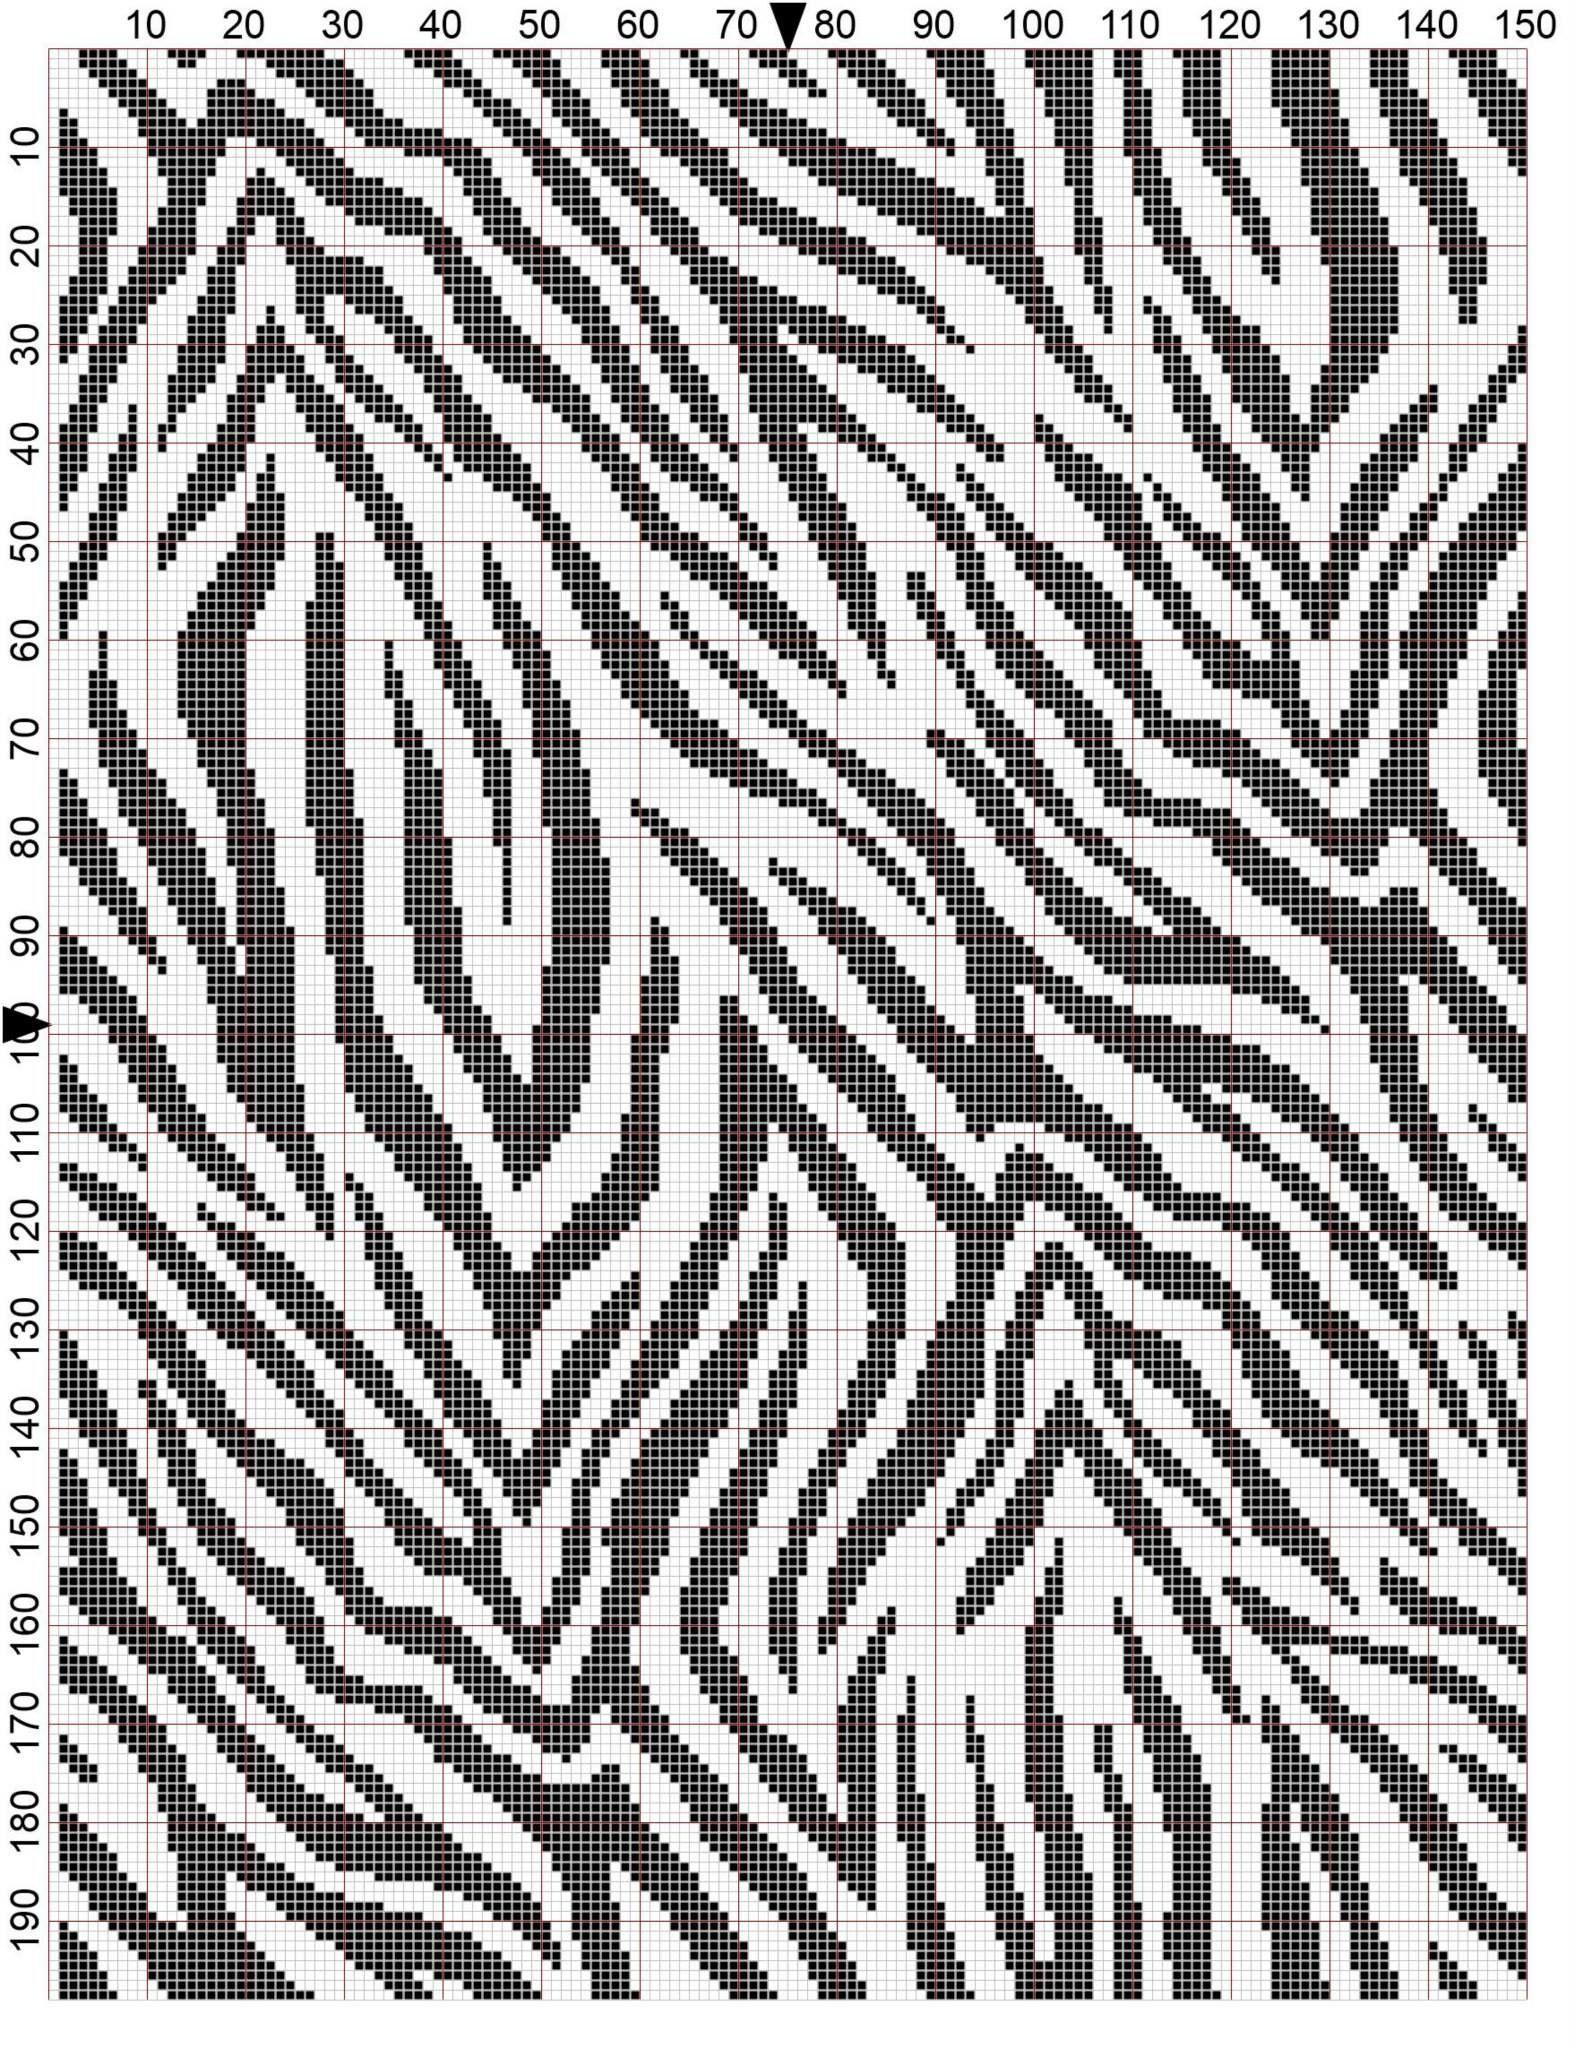 Zebra crochet chart I found online | Knitting Crotchet | Pinterest ...